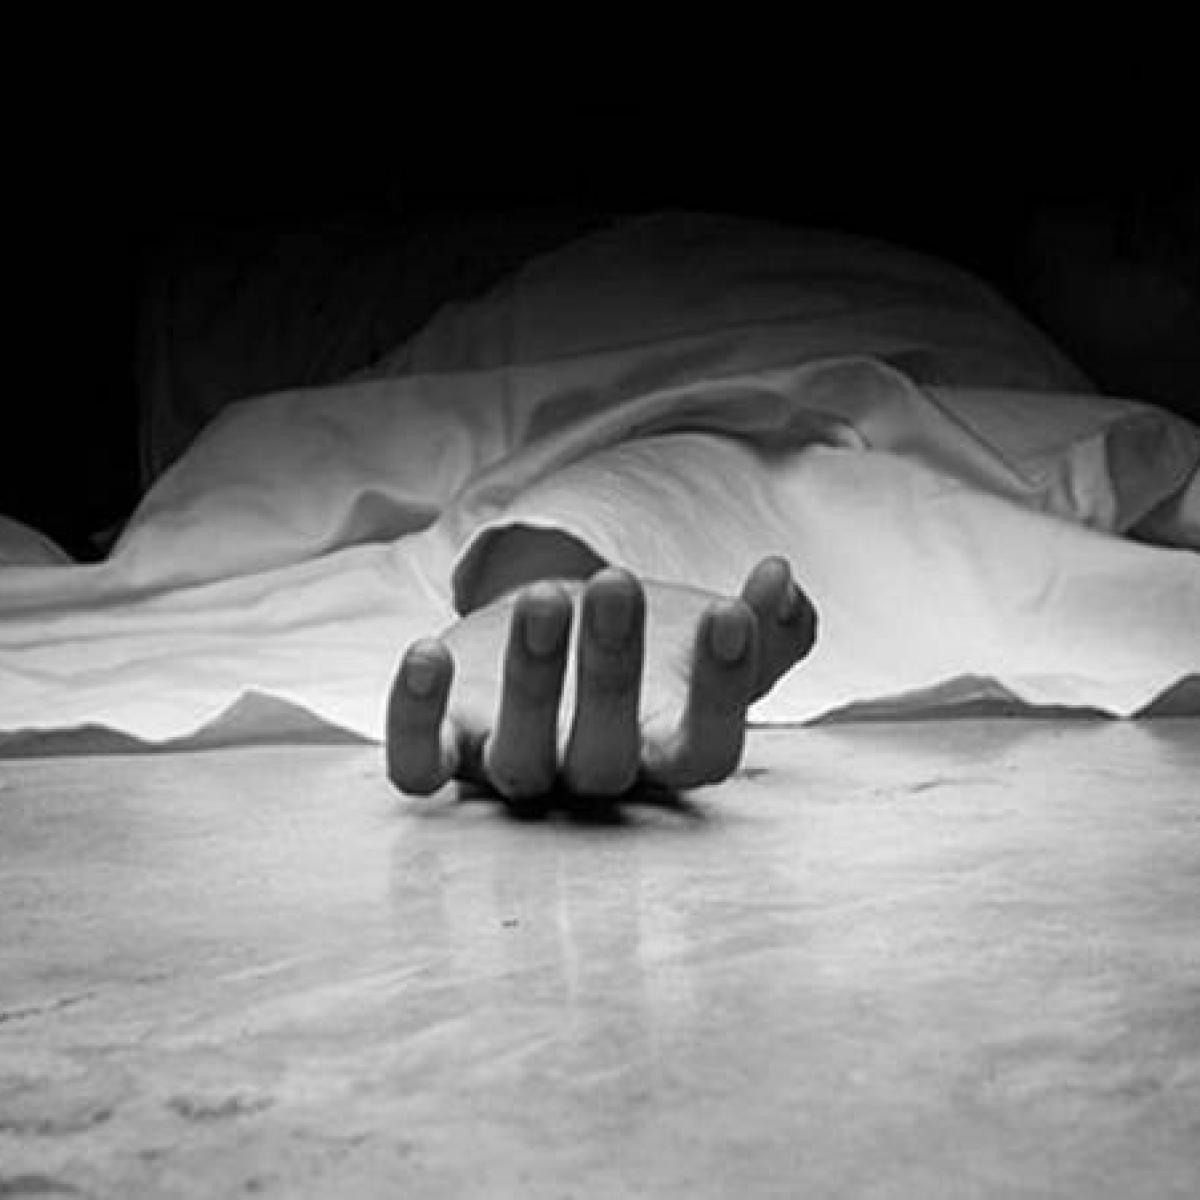 Mumbai Crime: 19-year-old girl killed after speeding car hits her at Chunabhatti